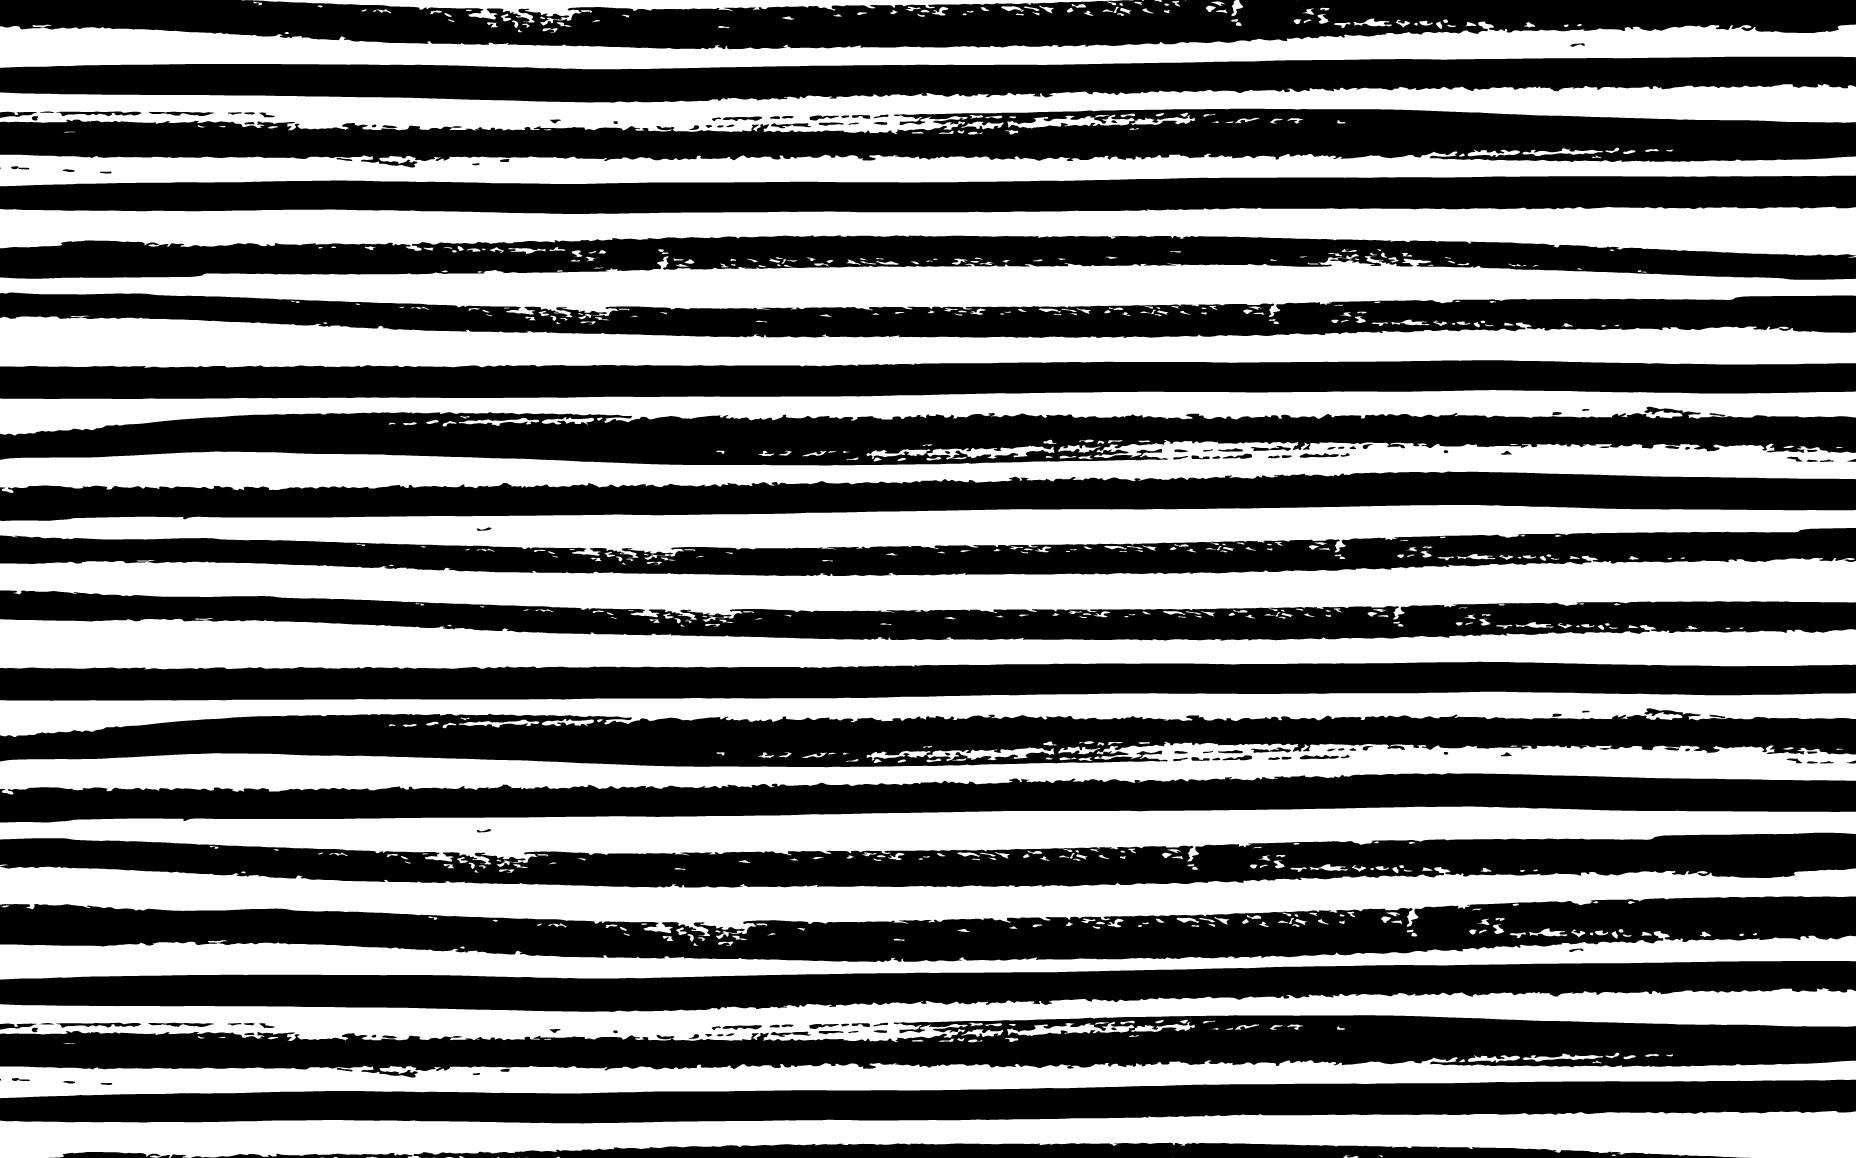 Stripes_Desktop.jpg